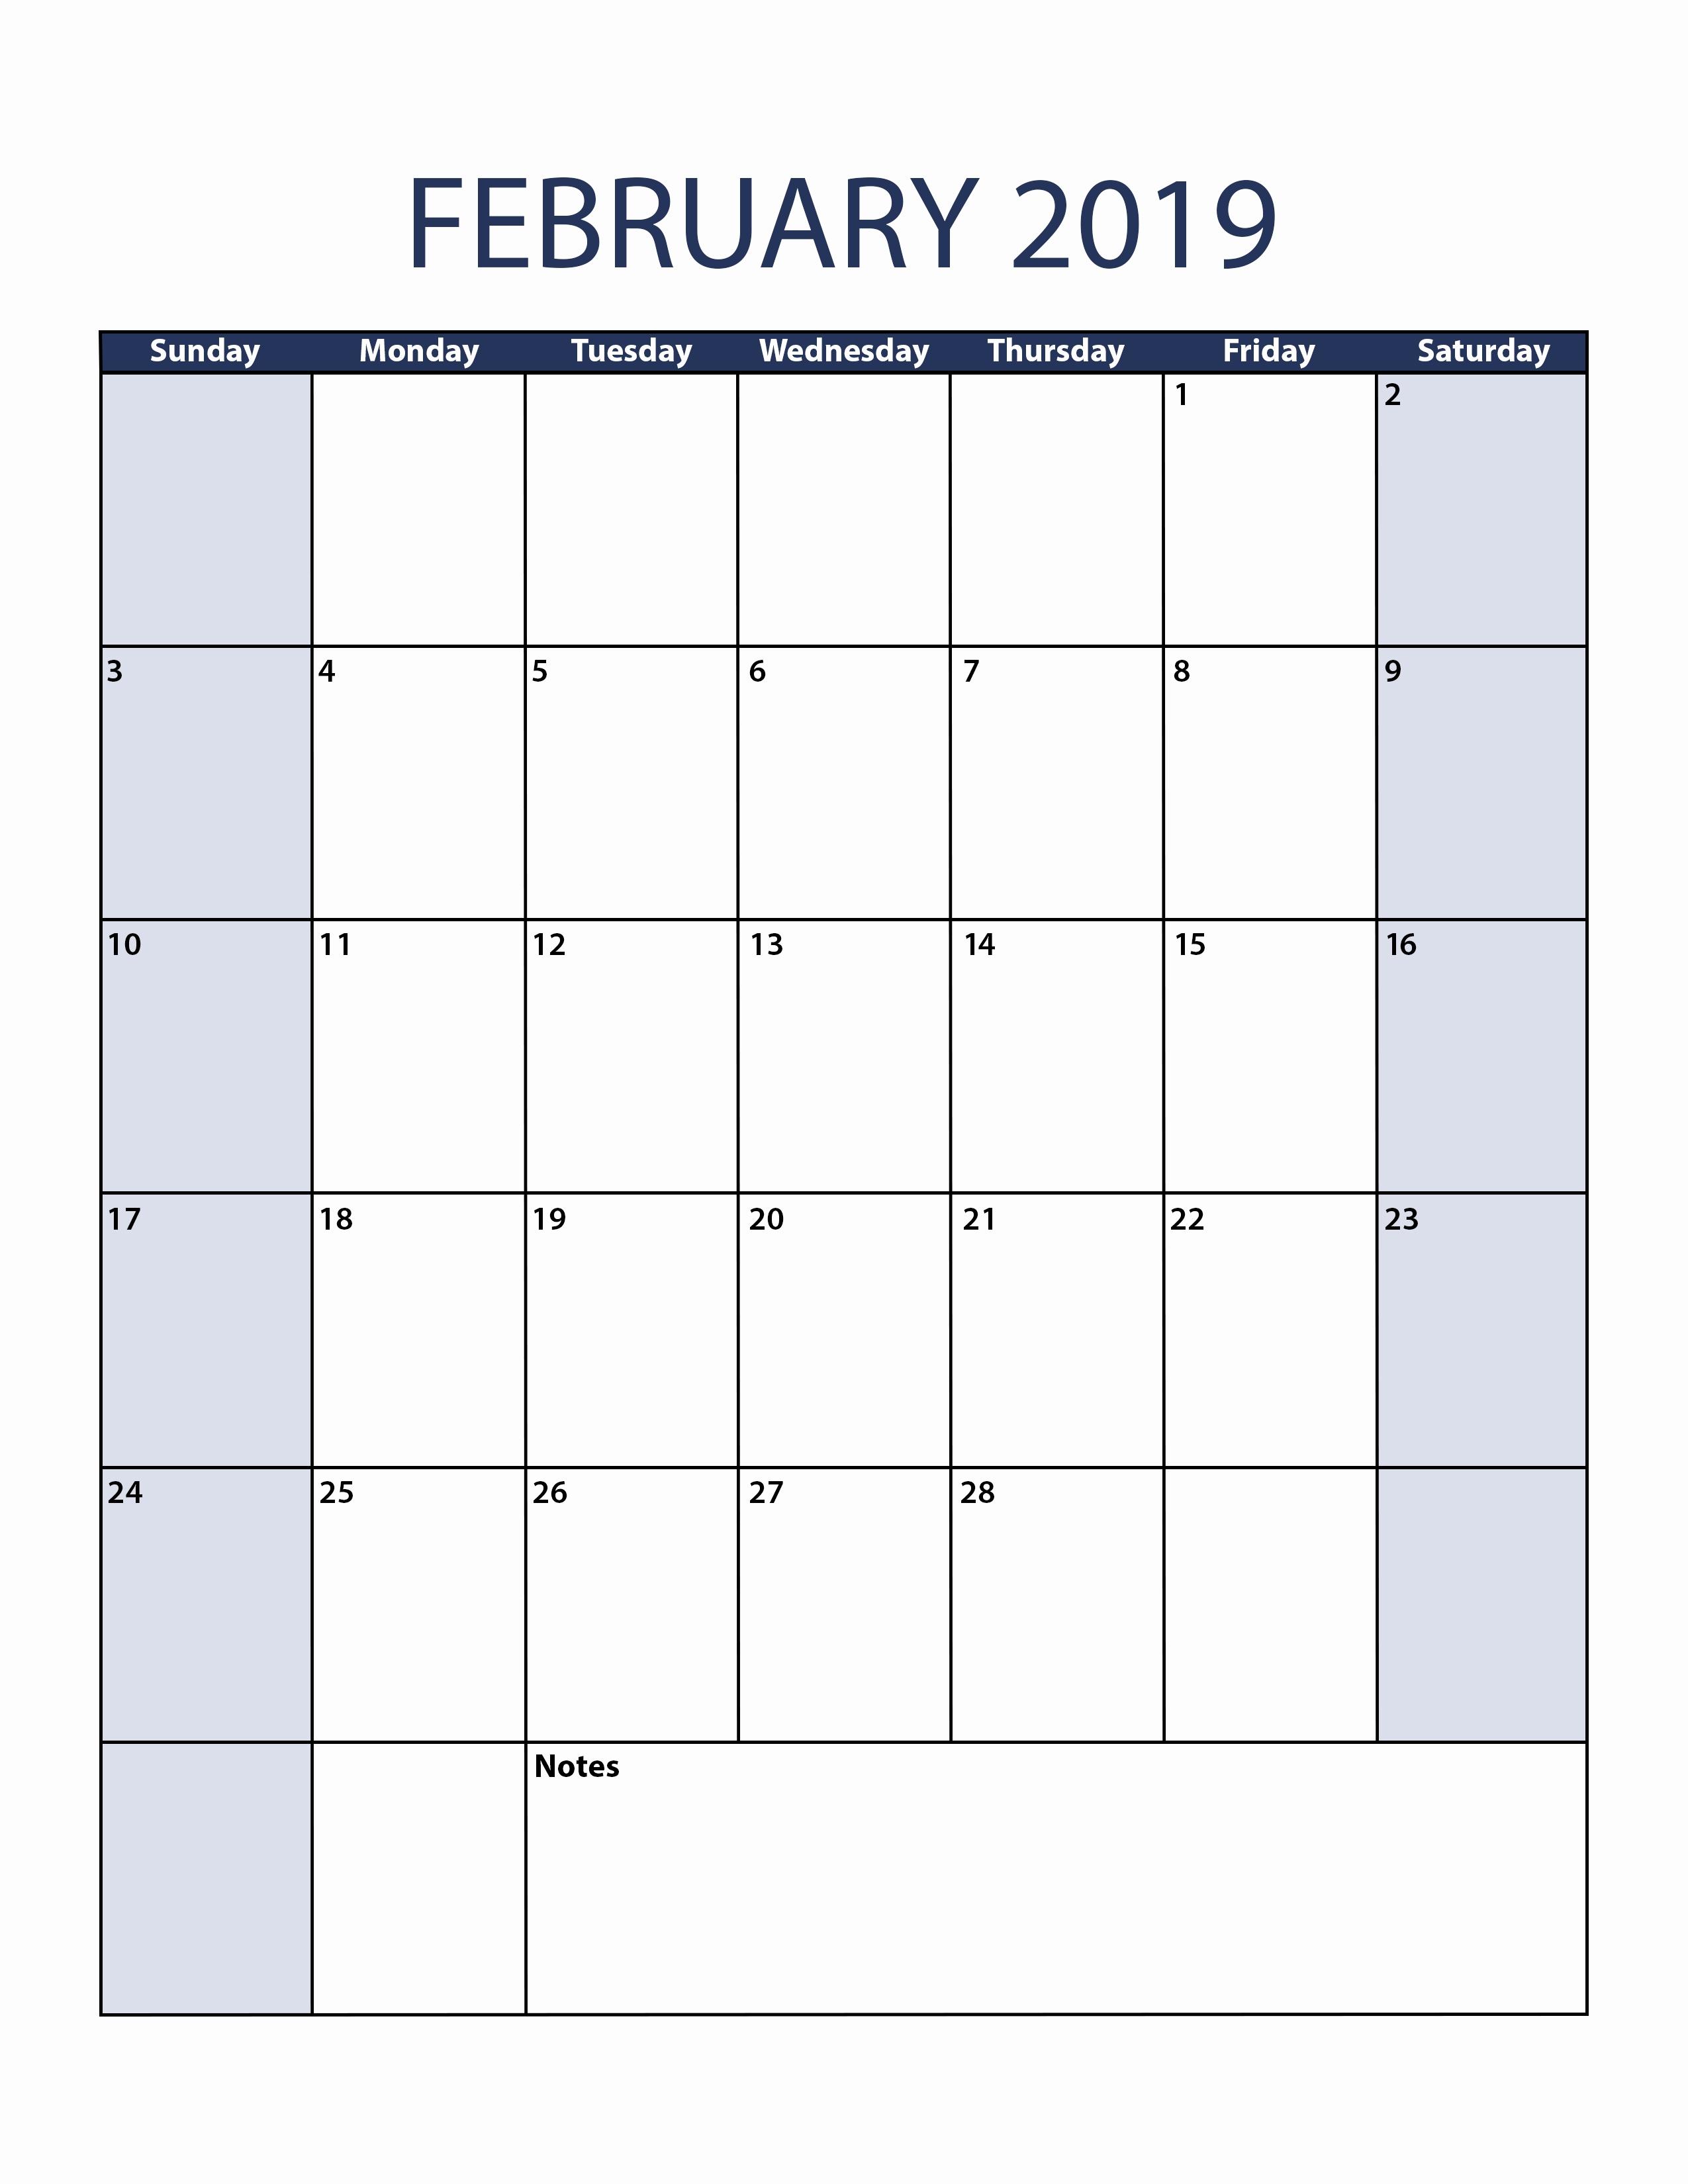 2019 calendar uk printable february 2019 ::February 2019 Calendar UK